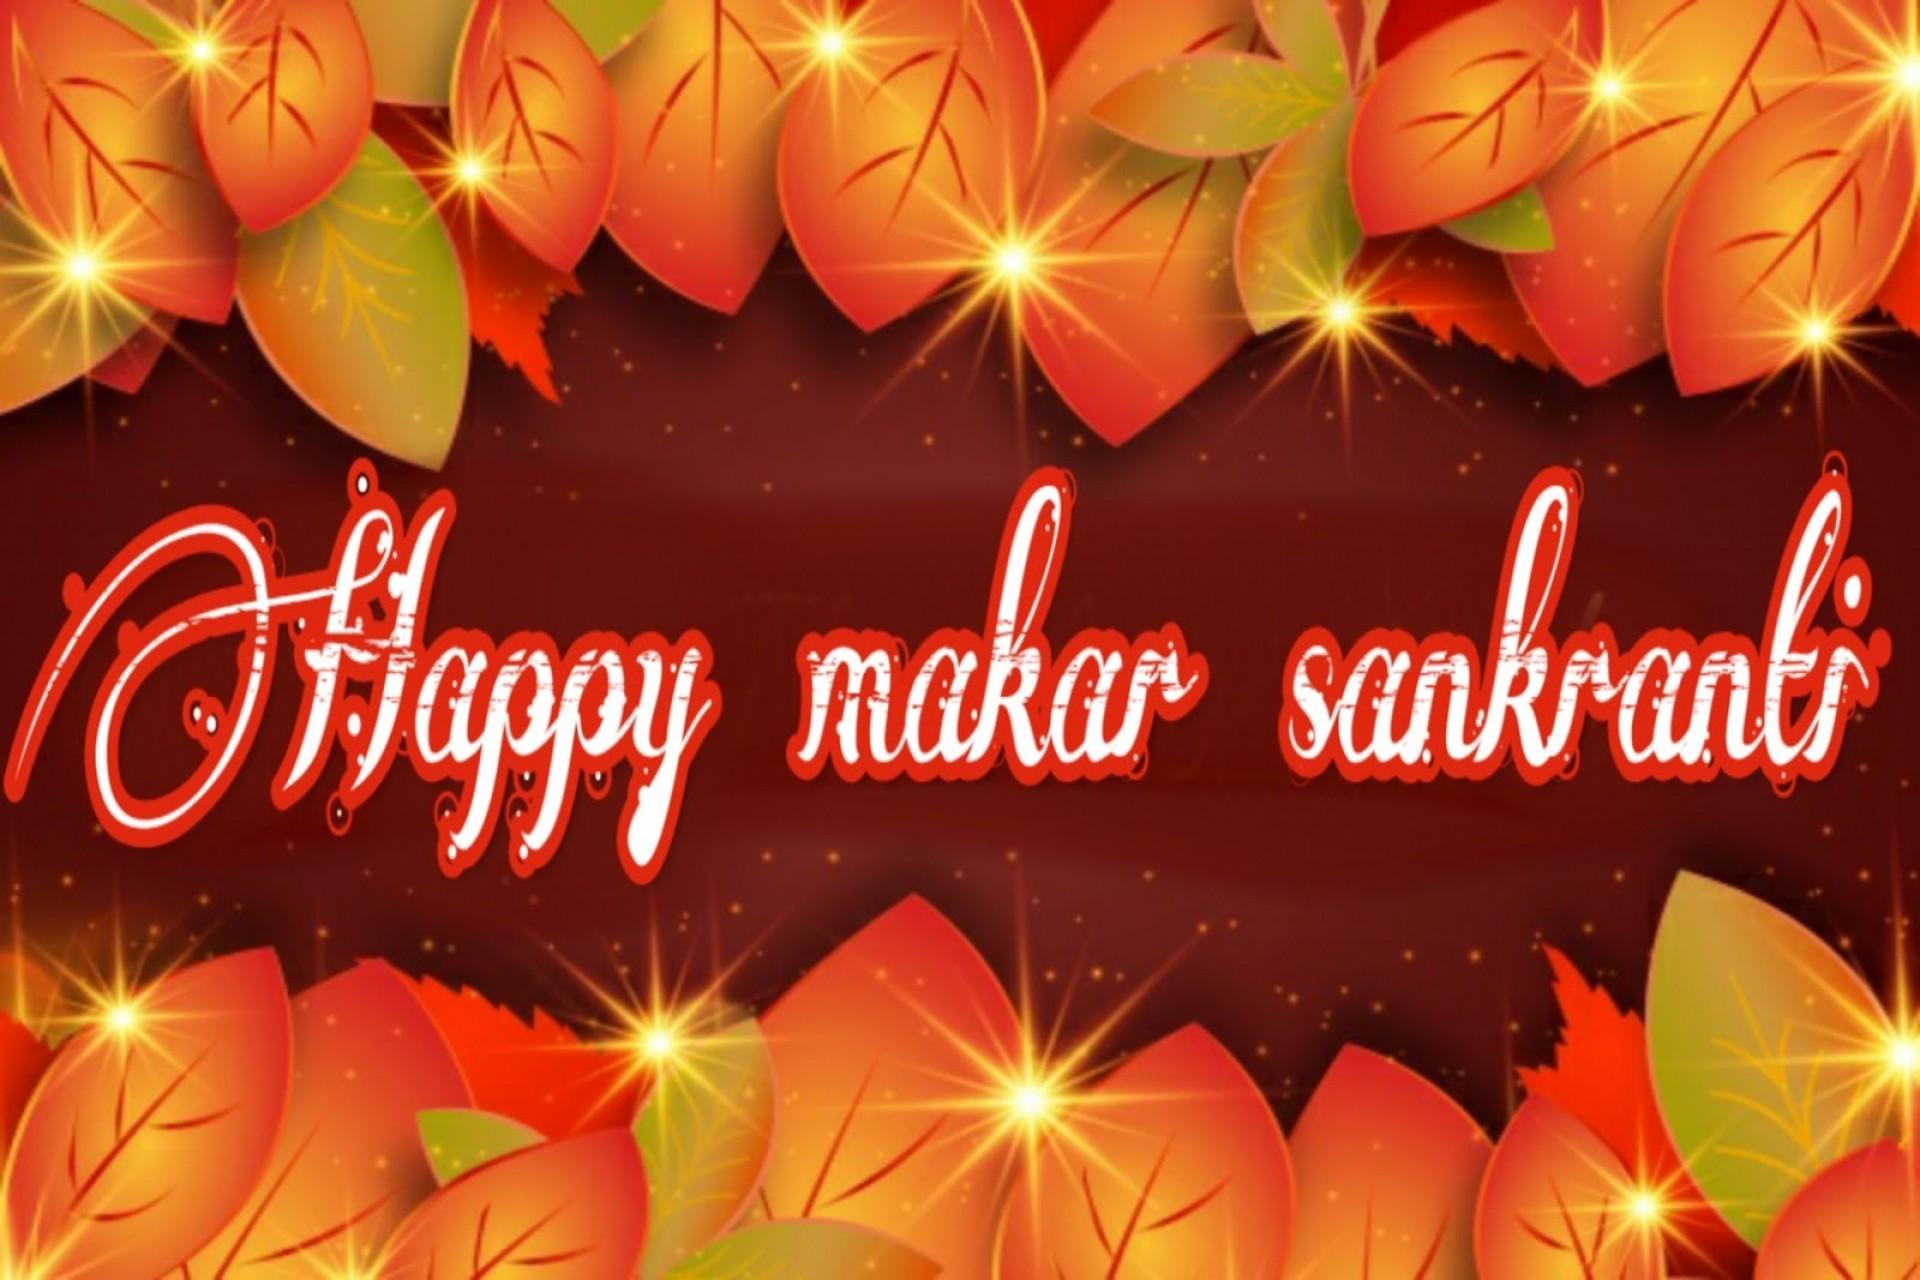 005 Essay Example Makar Sankranti In Hindi Surprising Pdf Download 2018 1920